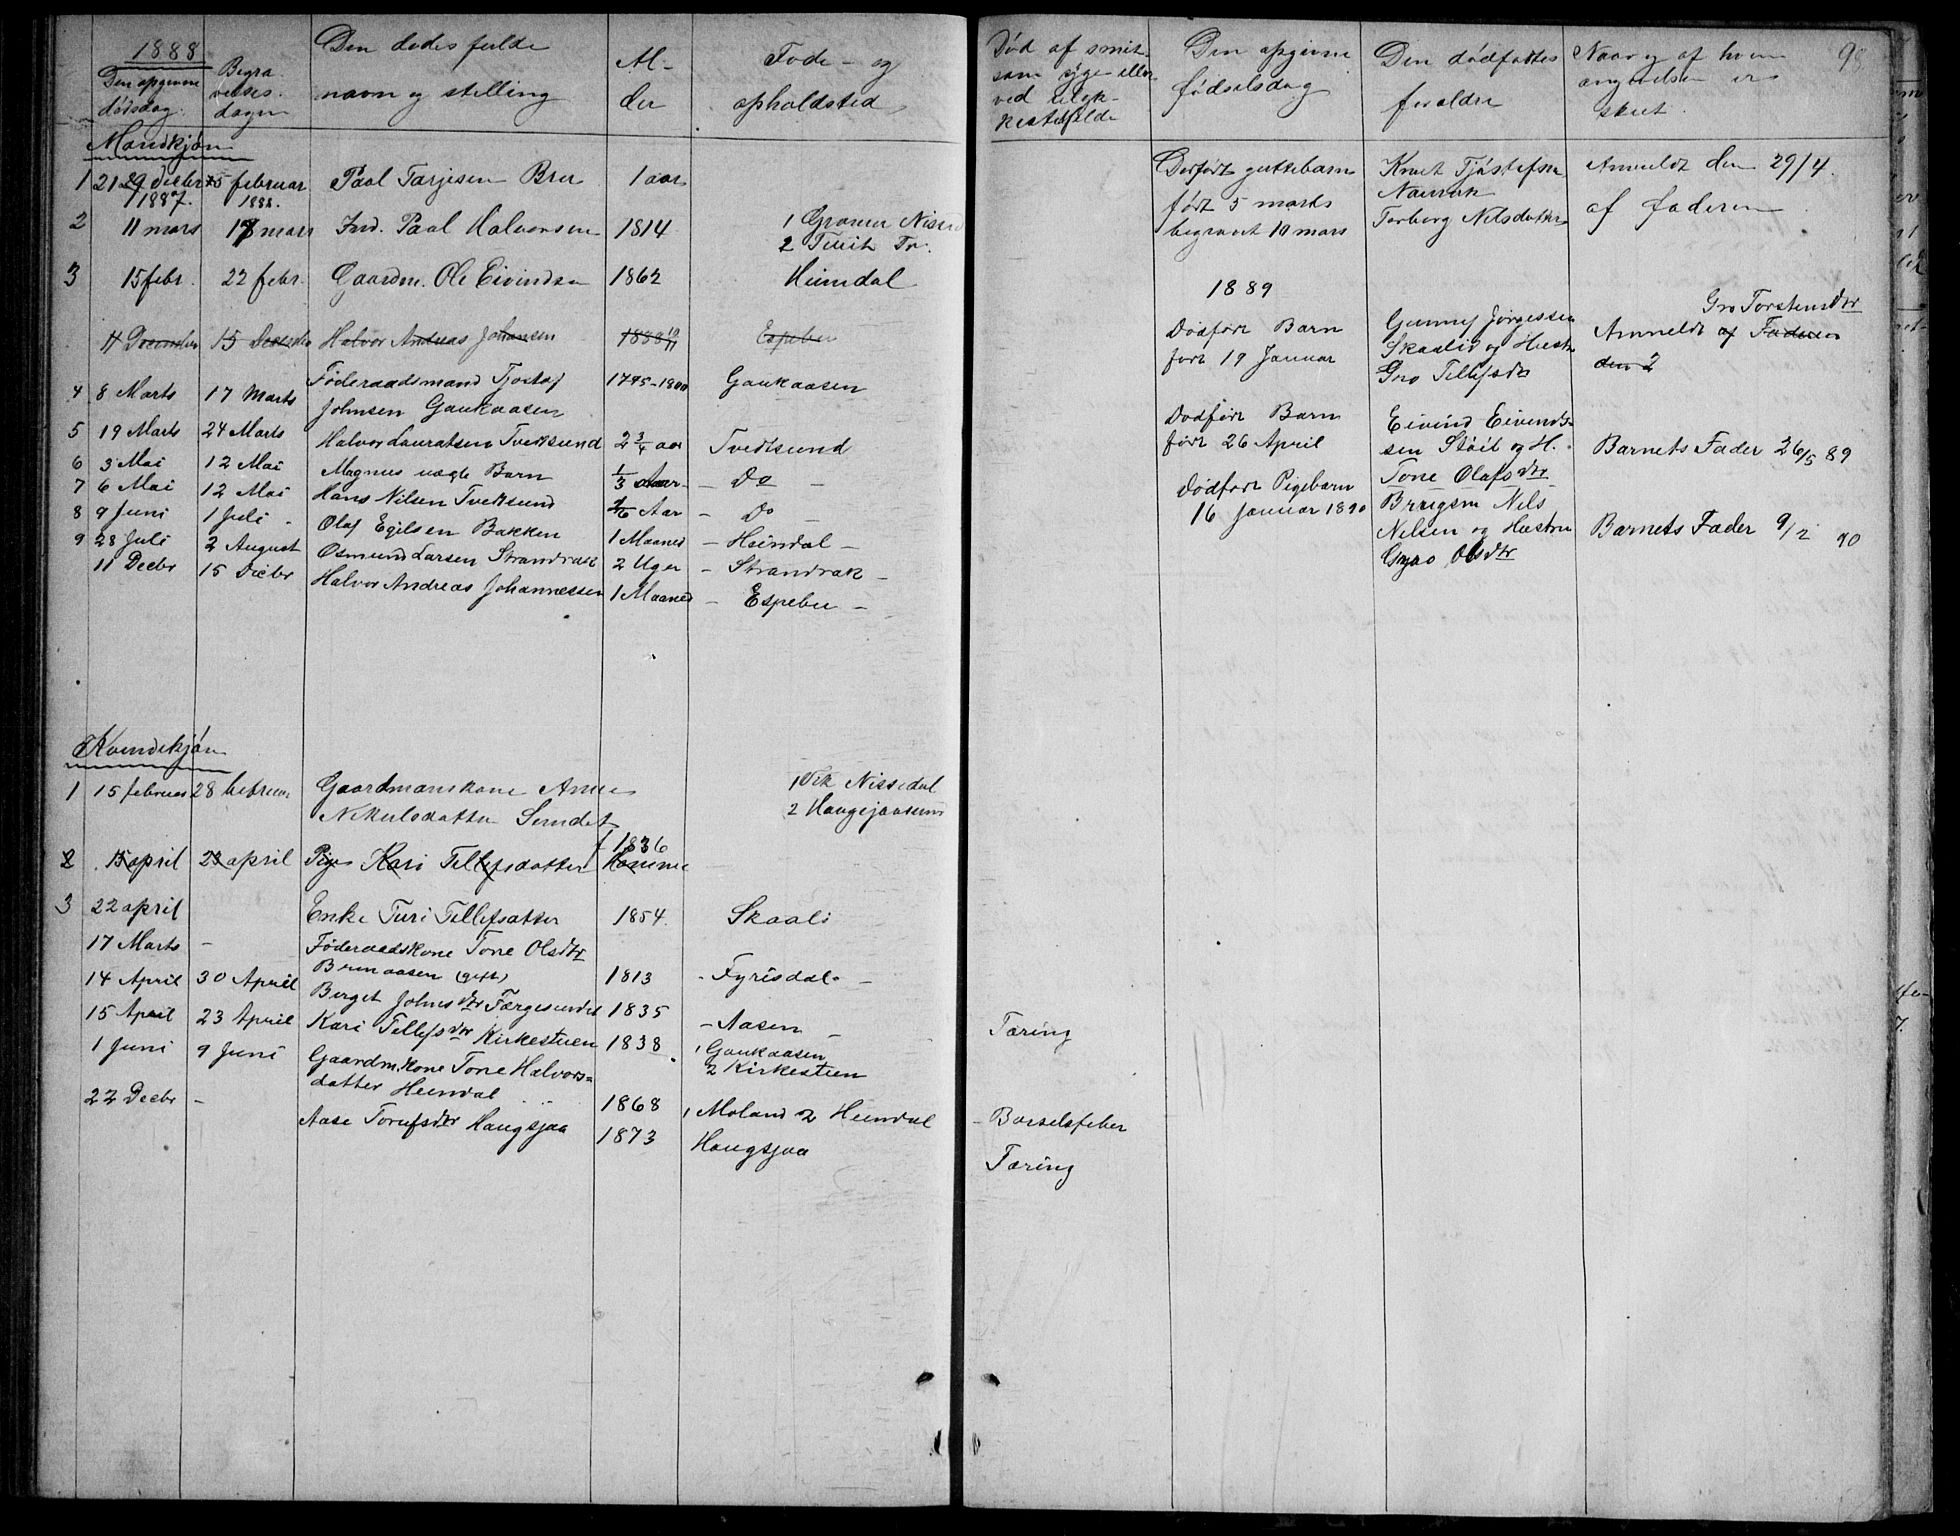 SAKO, Nissedal kirkebøker, G/Gb/L0002: Klokkerbok nr. II 2, 1863-1892, s. 98